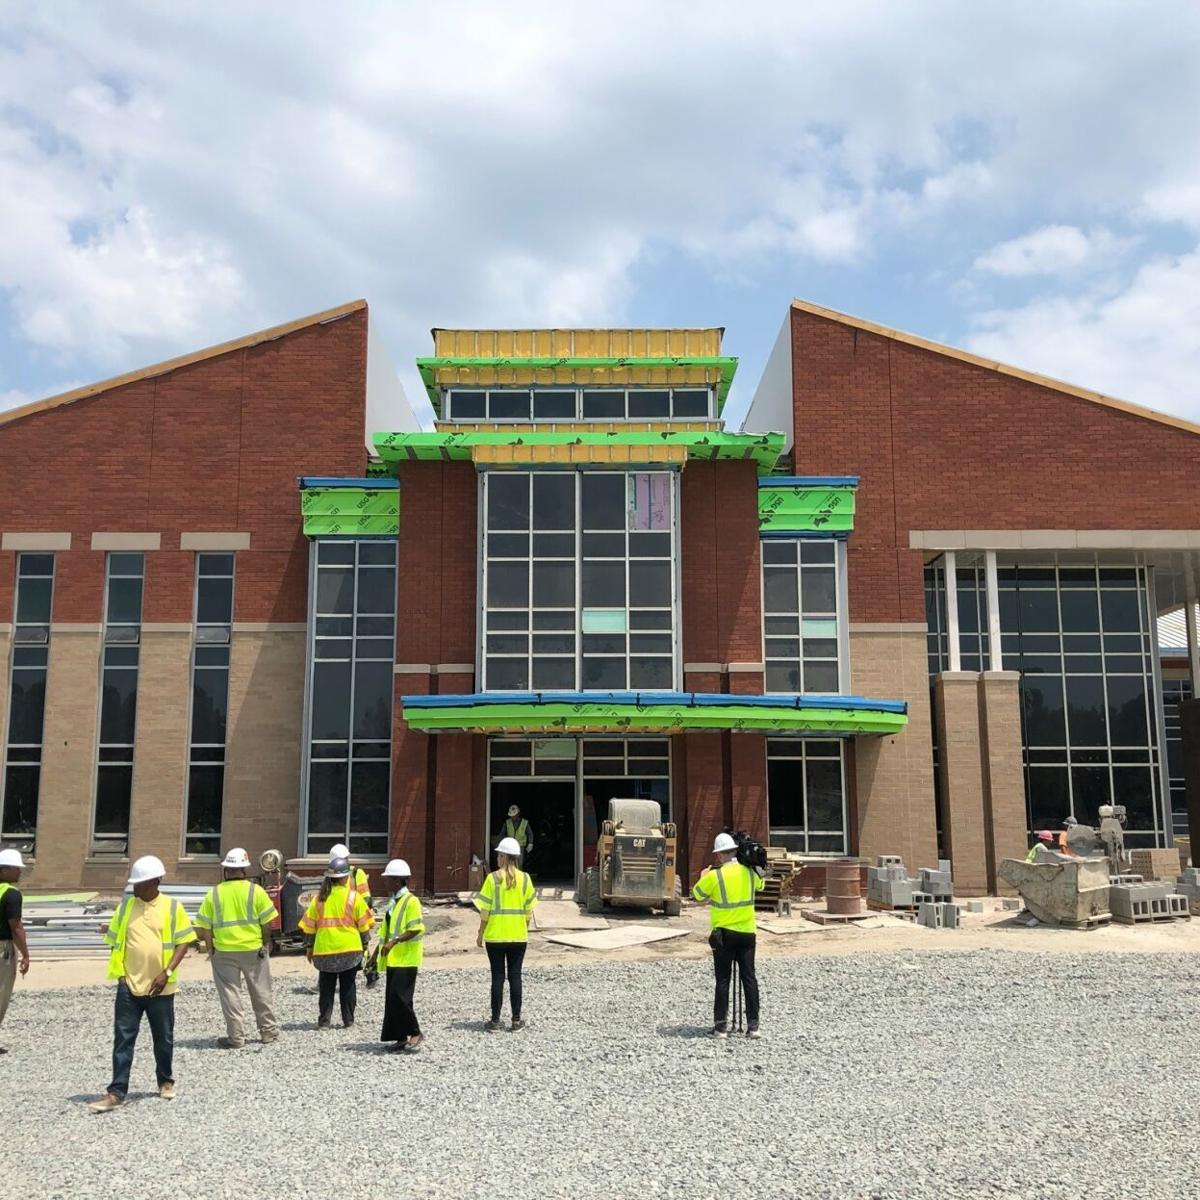 Northam's $250 million HVAC investment leaves education advocates underwhelmed